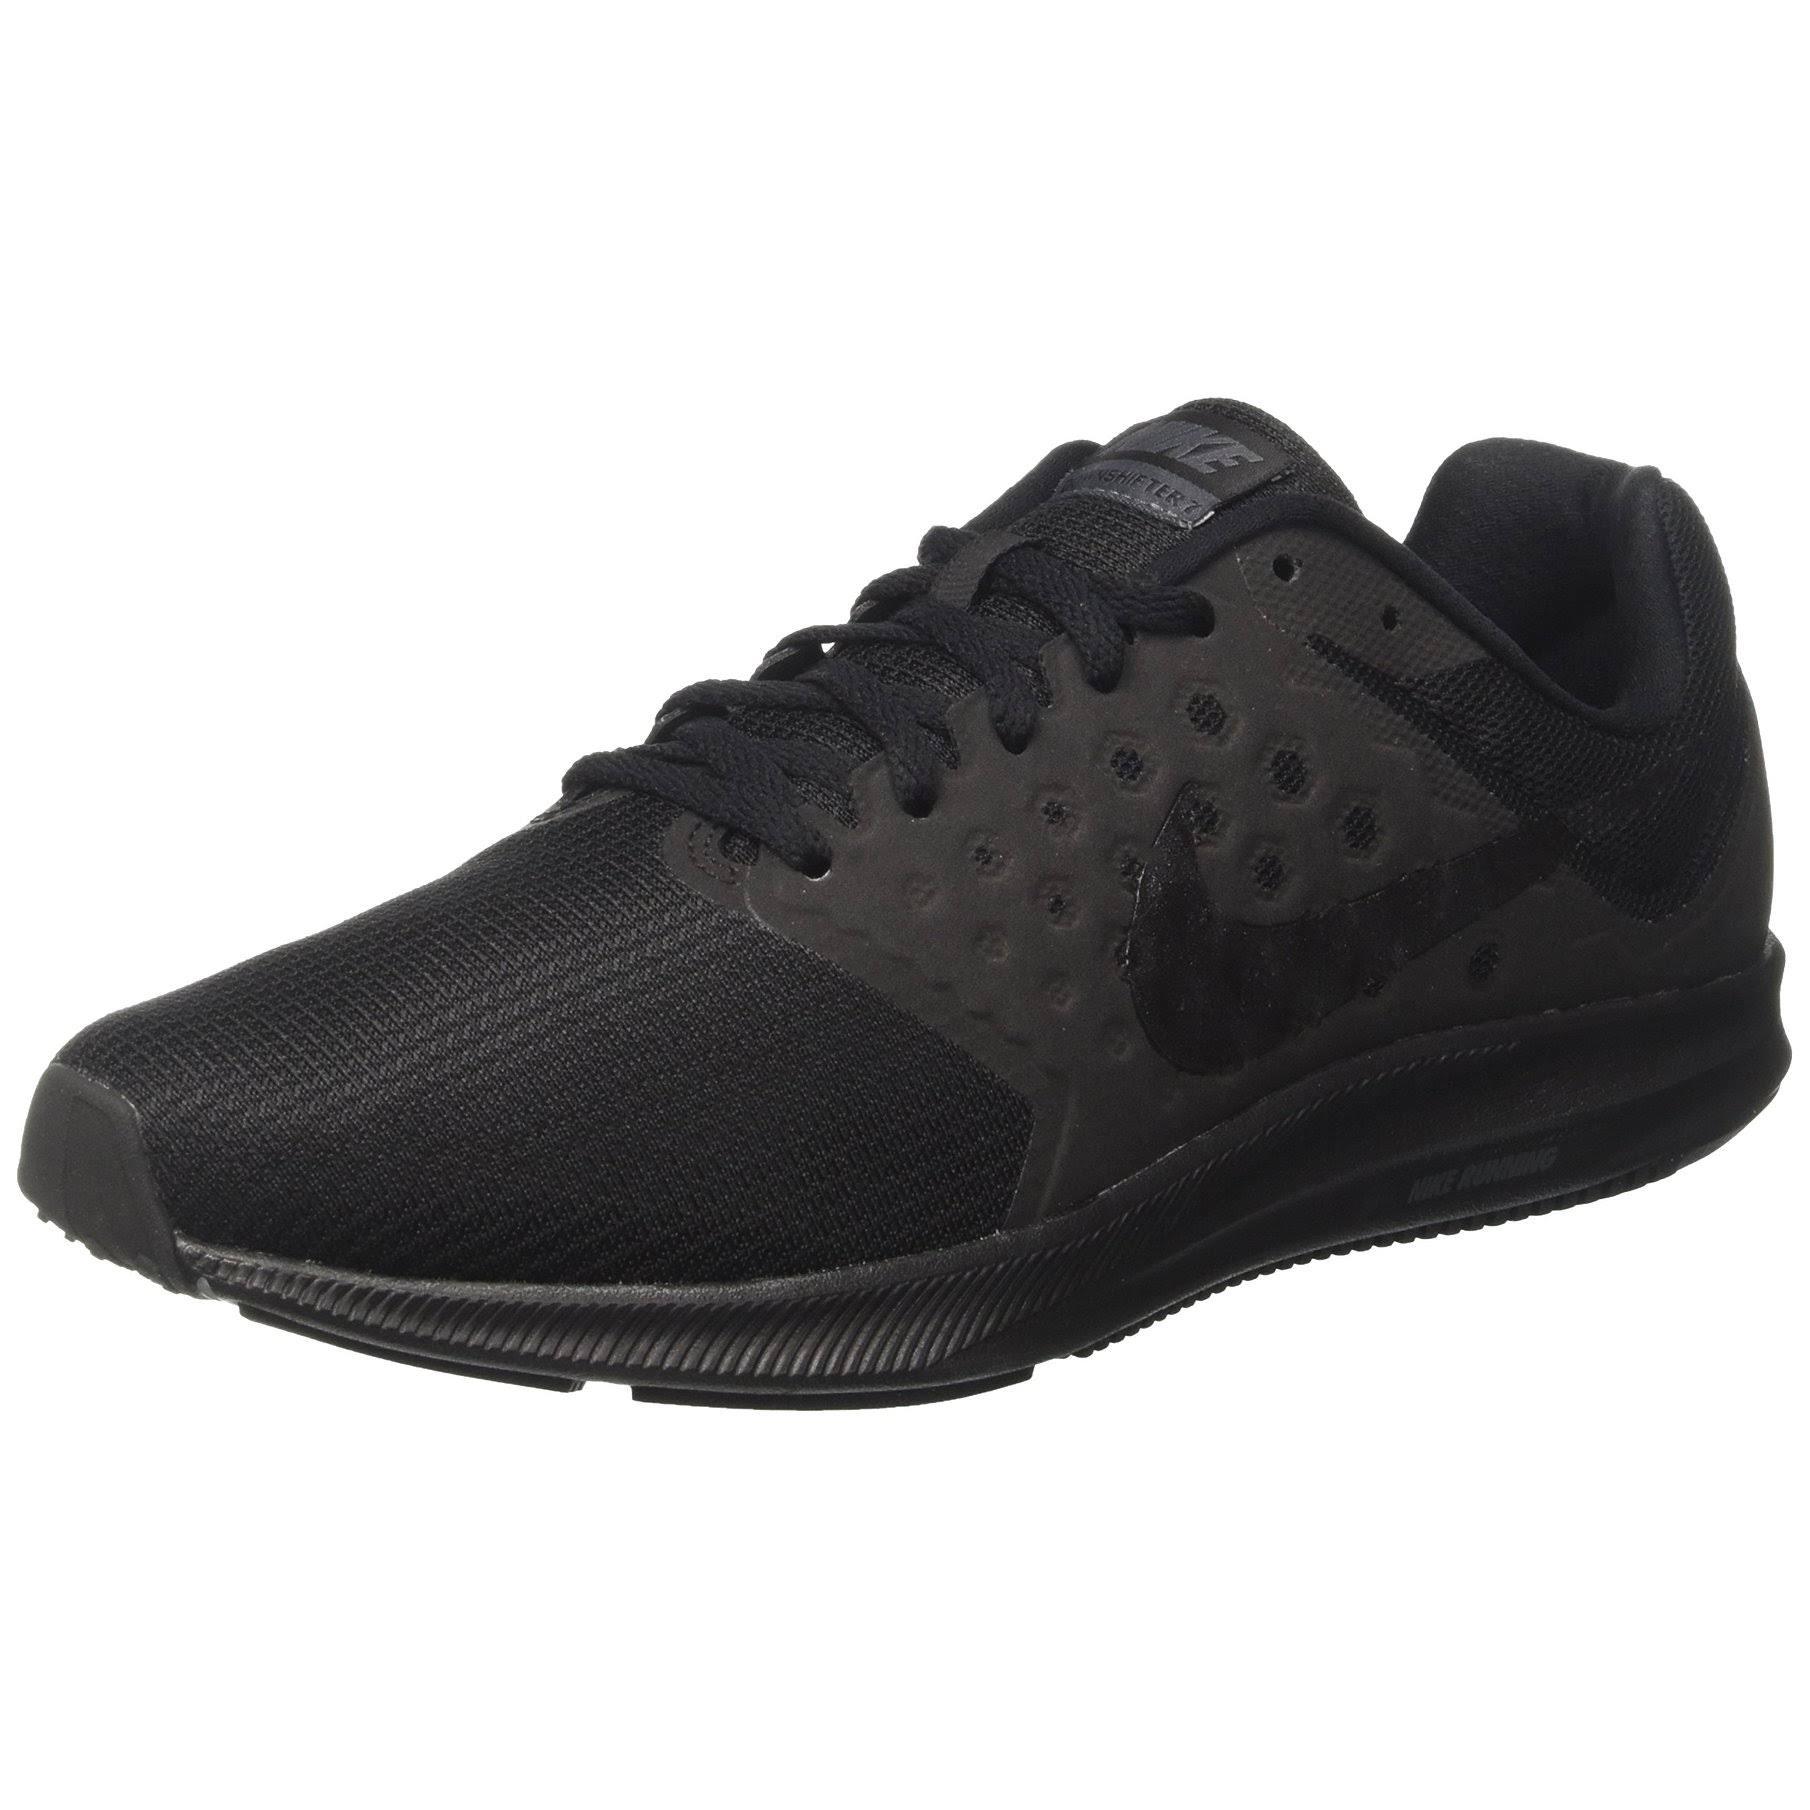 7 Nike 5 Mens Downshifter Negro Metálico Tamaño antracita Style 10 852459 Hematita TBB5wq